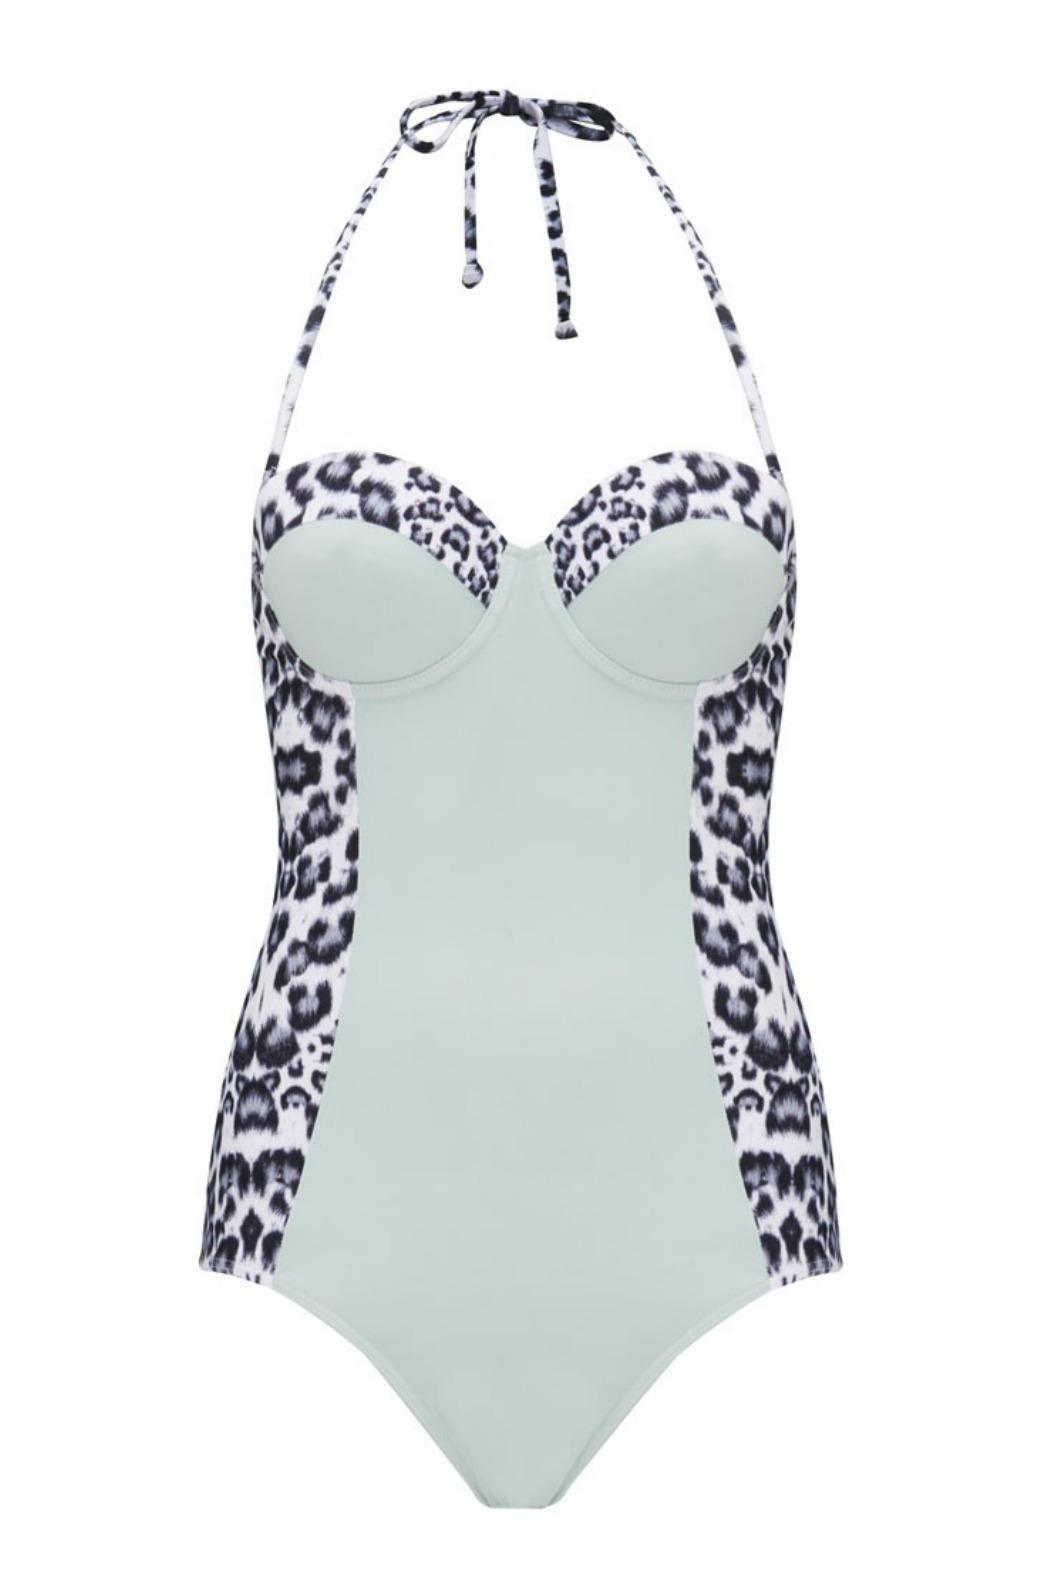 Sale Lowest Price SWIMWEAR - Bikini tops Lily And Lionel Sale Classic fU0WbWcx